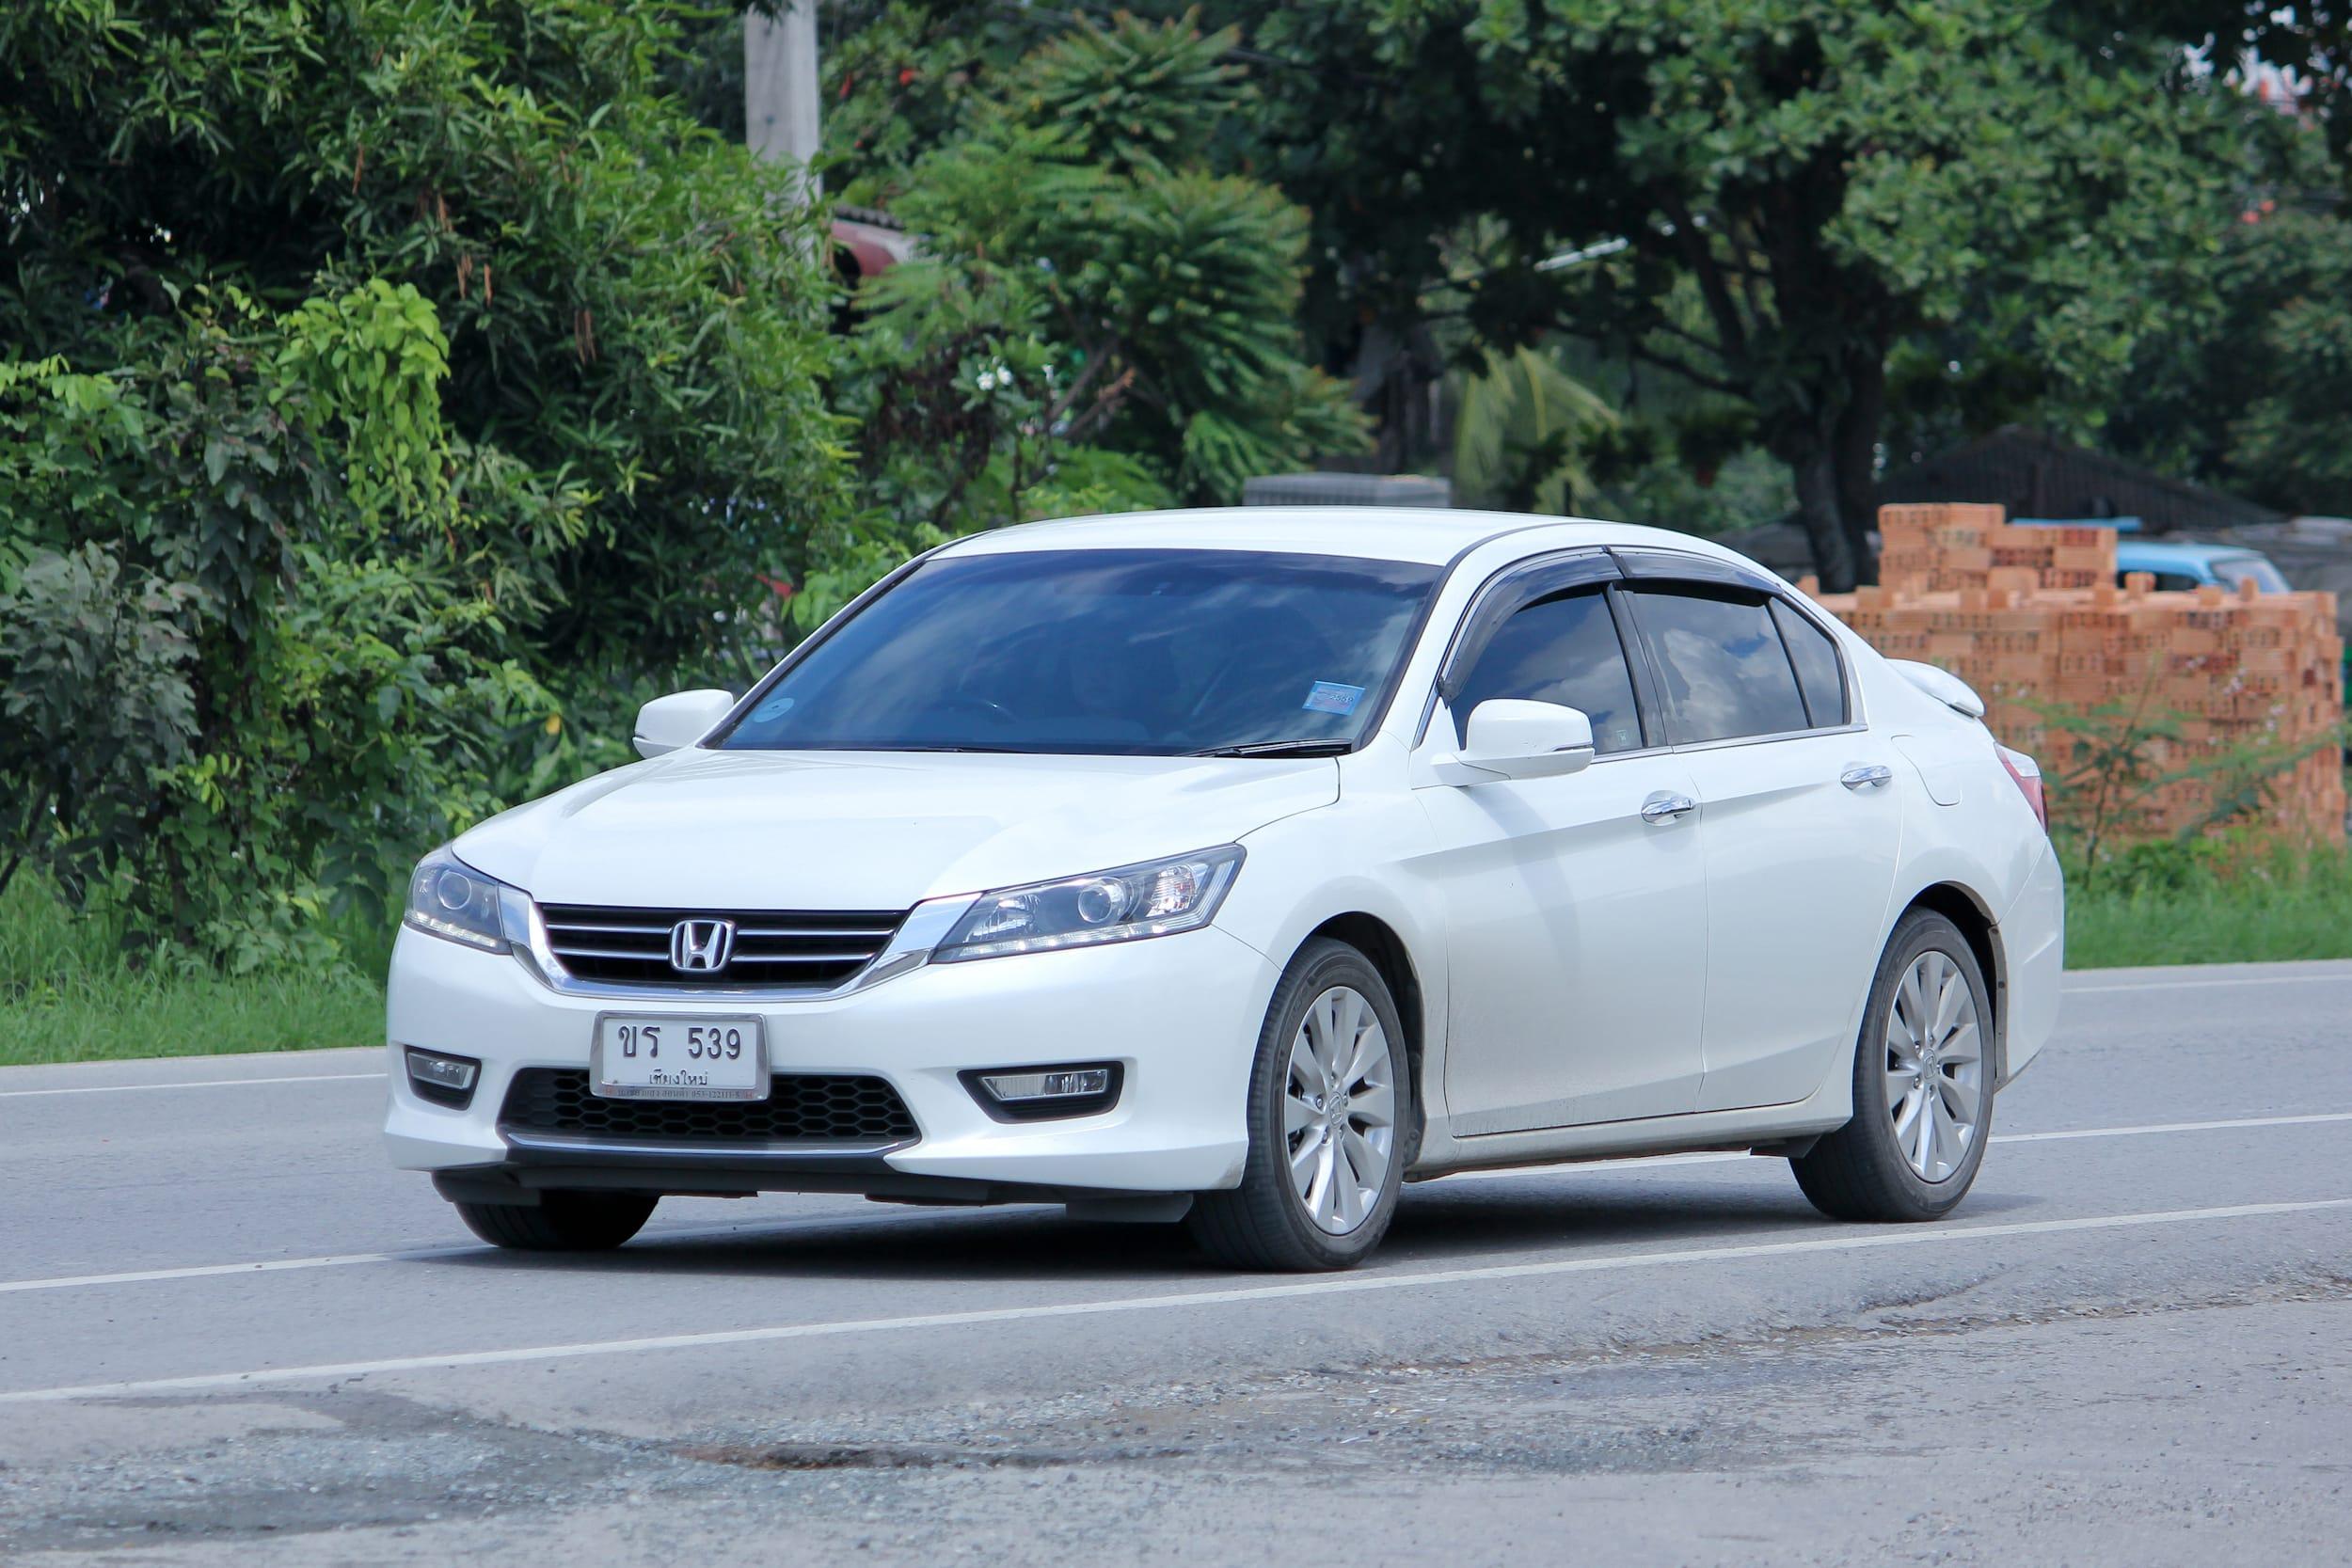 Honda AirBag Inflators May Explode Unexpectedly or Deflate